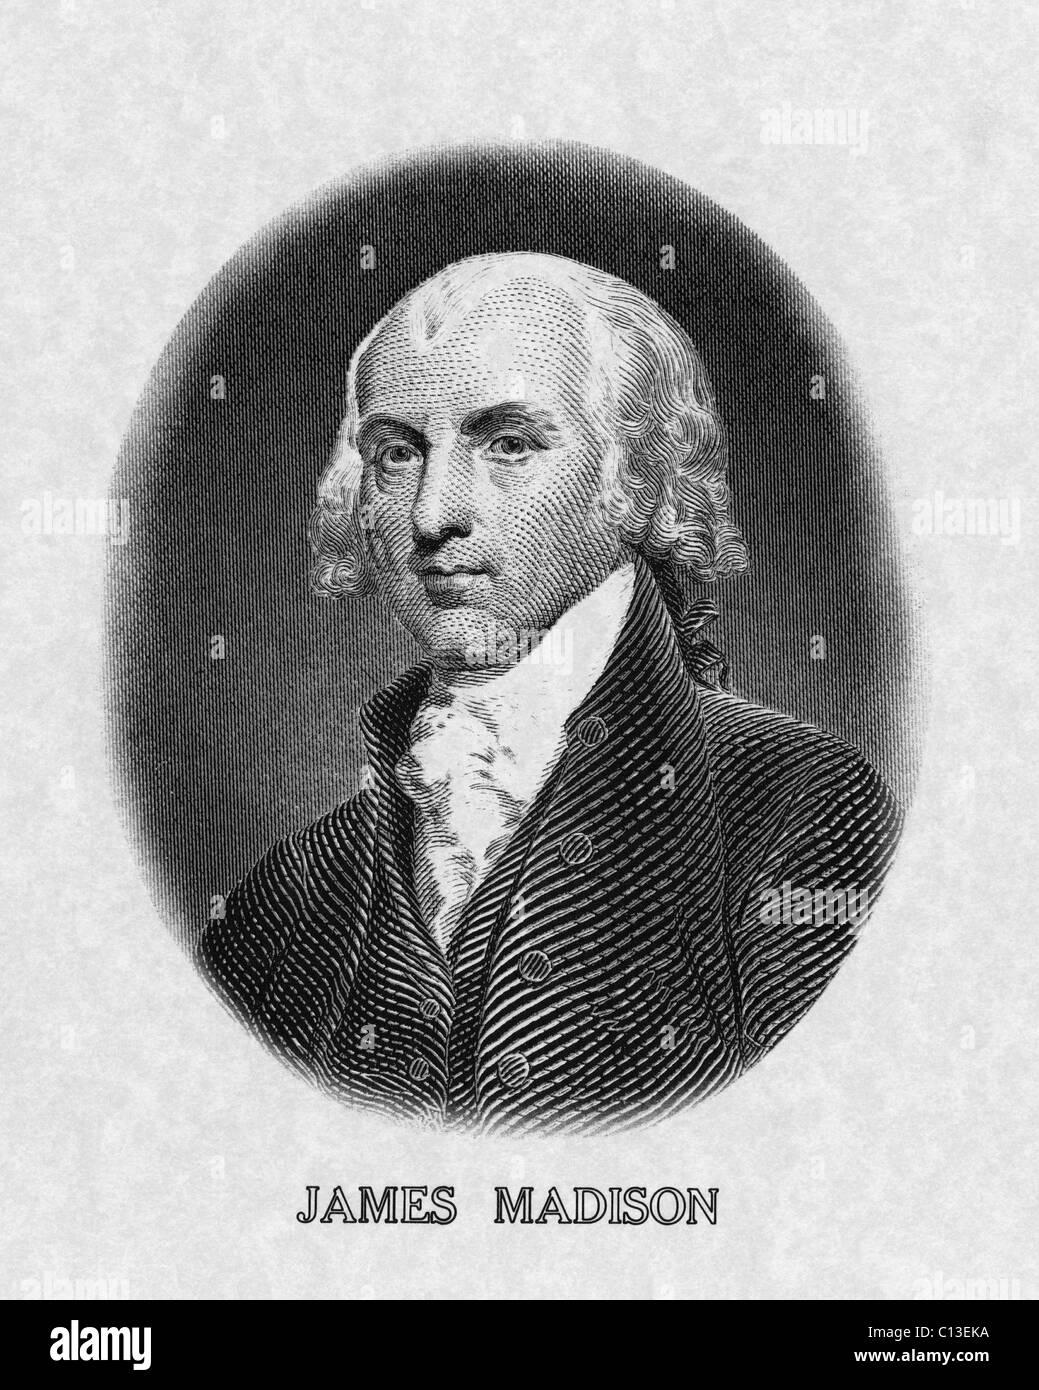 US Presidents. US President James Madison. - Stock Image